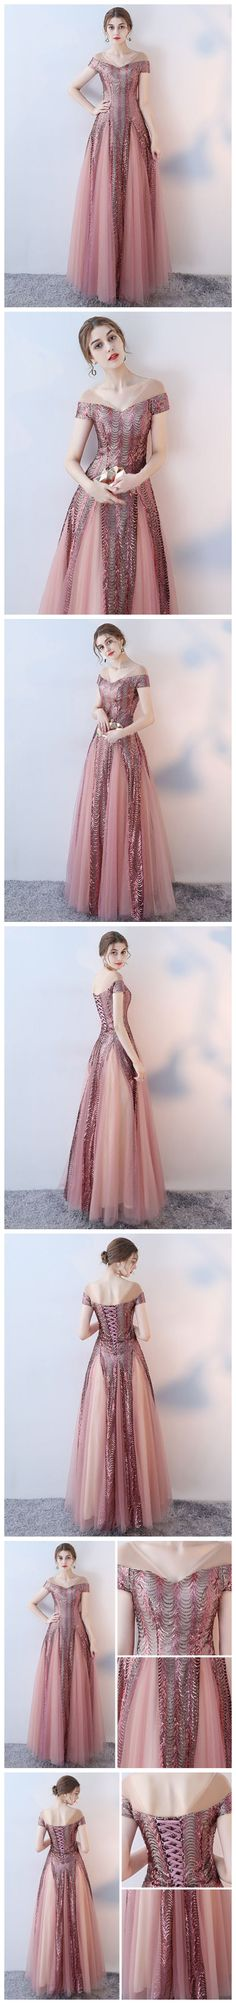 CHIC A-LINE V-NECK PINK FLOOR LENGTH SEQUINS LONG PROM DRESS EVENING DRESS AM619